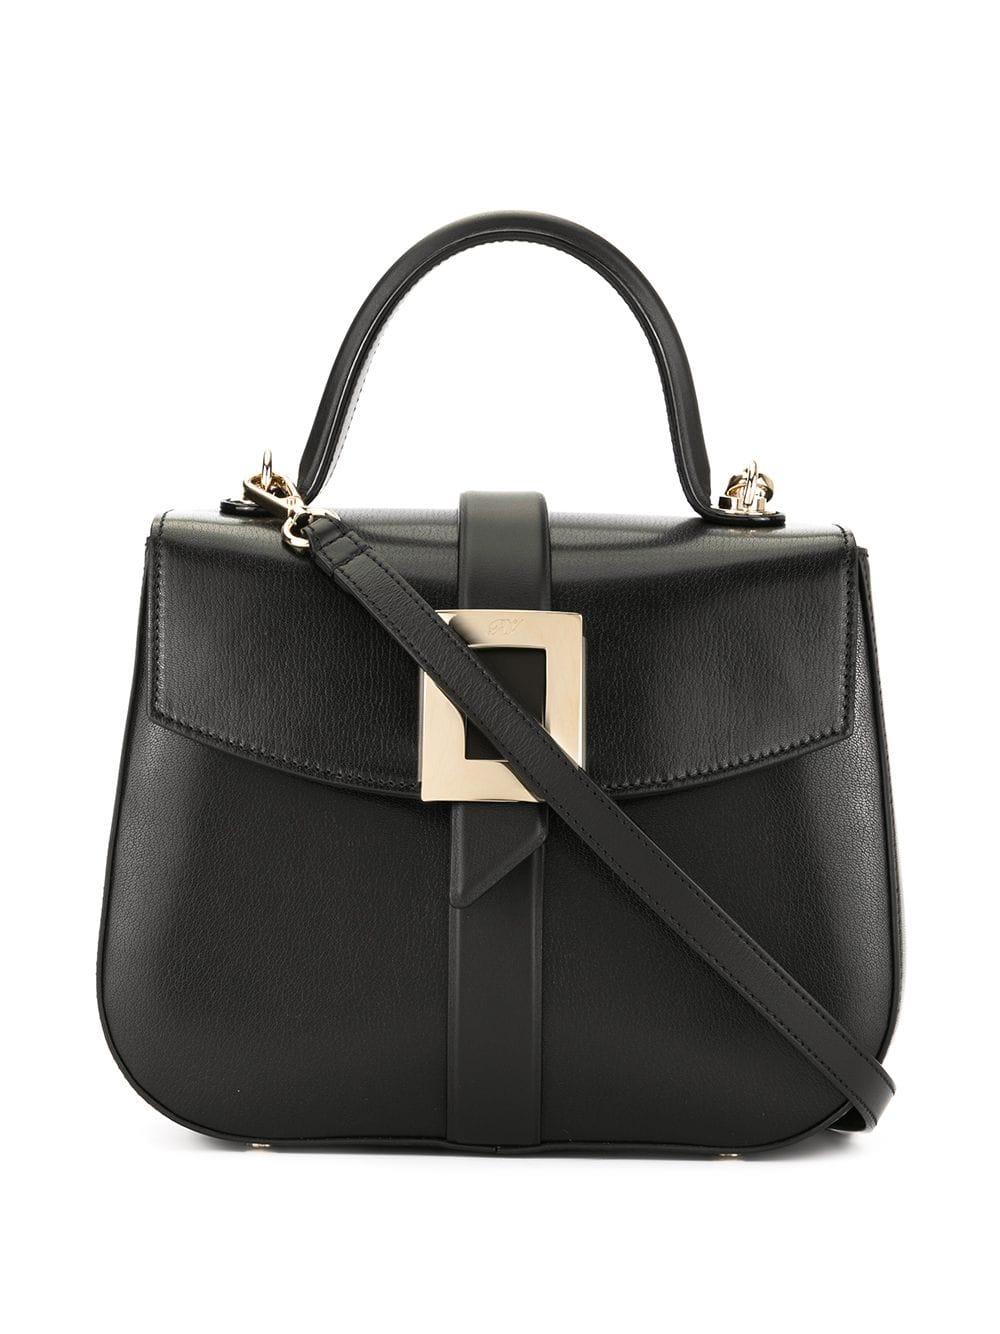 Beau Vivier Leather Bag